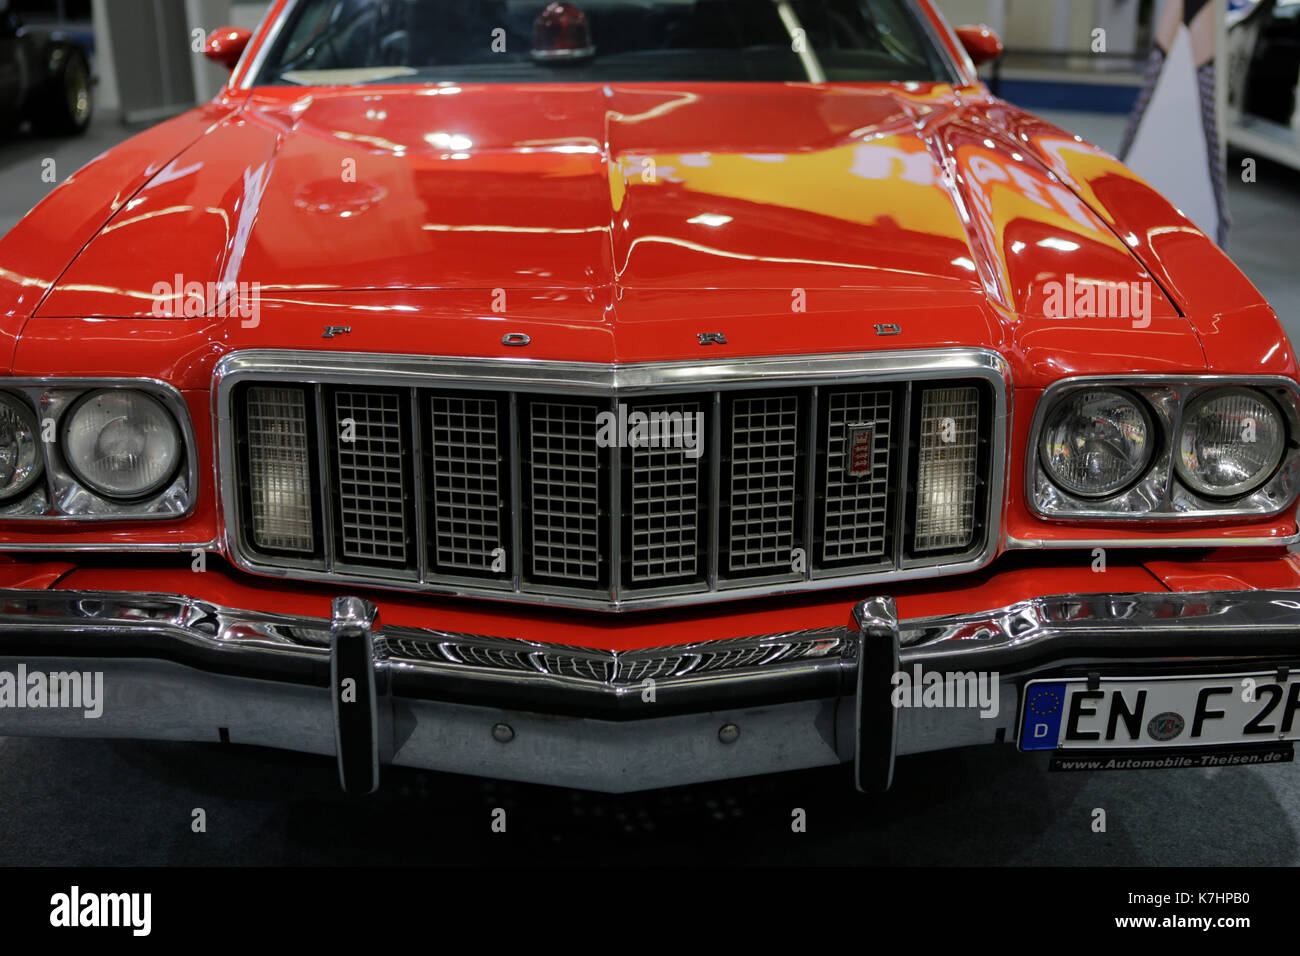 Ford Gran Torino Stock Photos Images Alamy 1970 Specs Frankfurt Germany 15th September 2017 A 1975 Starsky